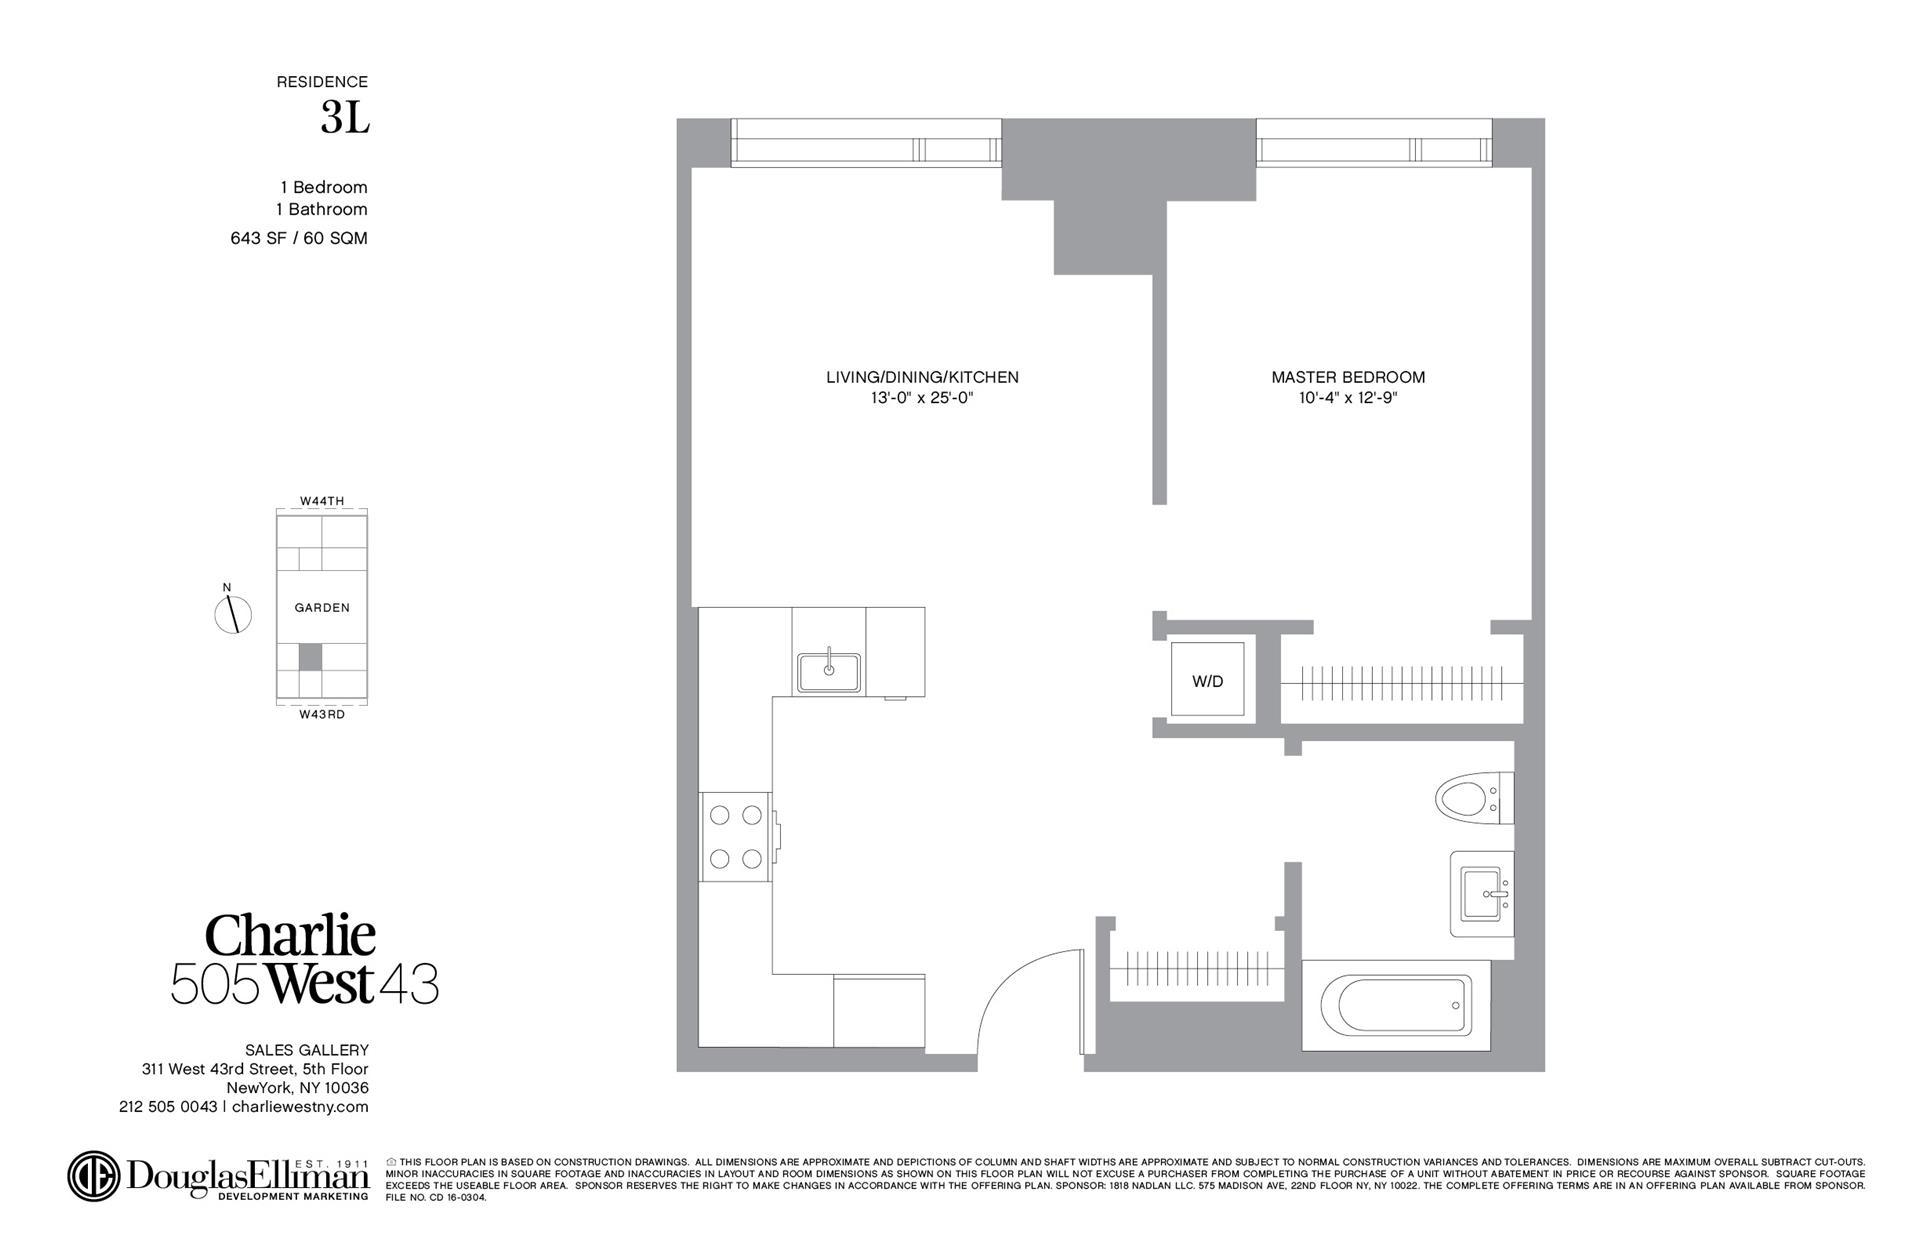 Floor plan of 505 West 43rd St, 3L - Clinton, New York